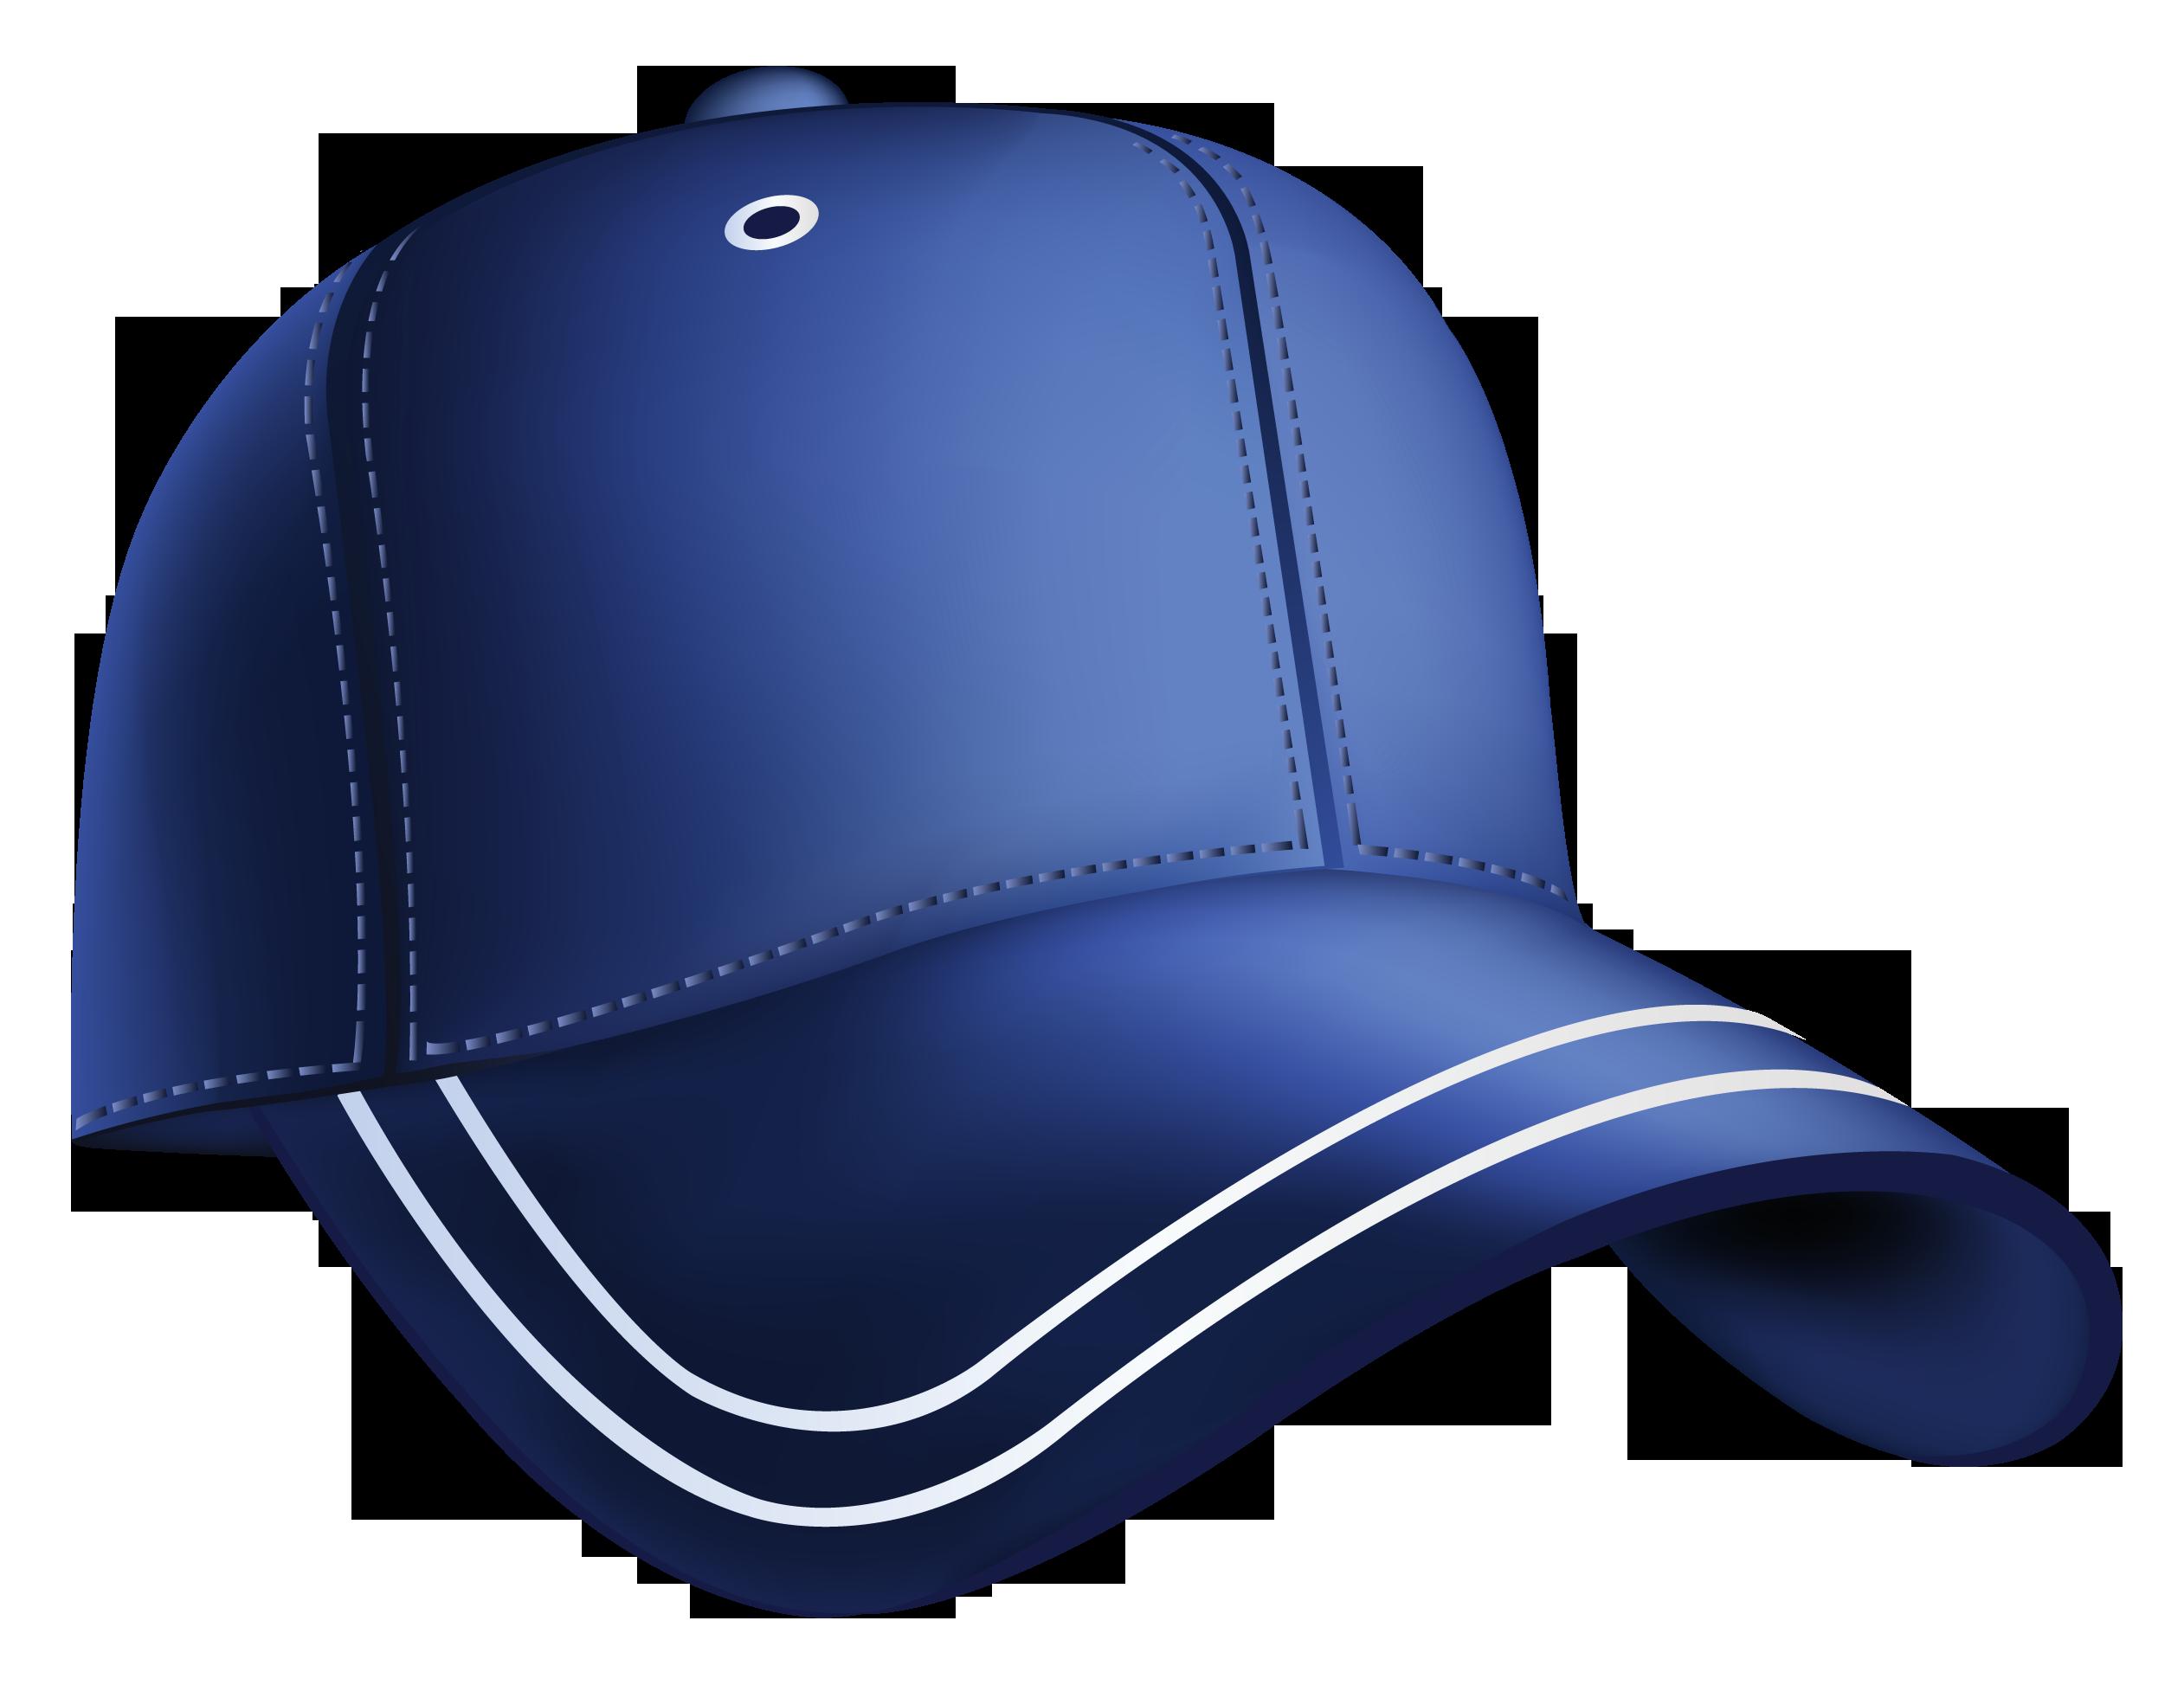 Hat Clipart - clipartall-Hat Clipart - clipartall-15